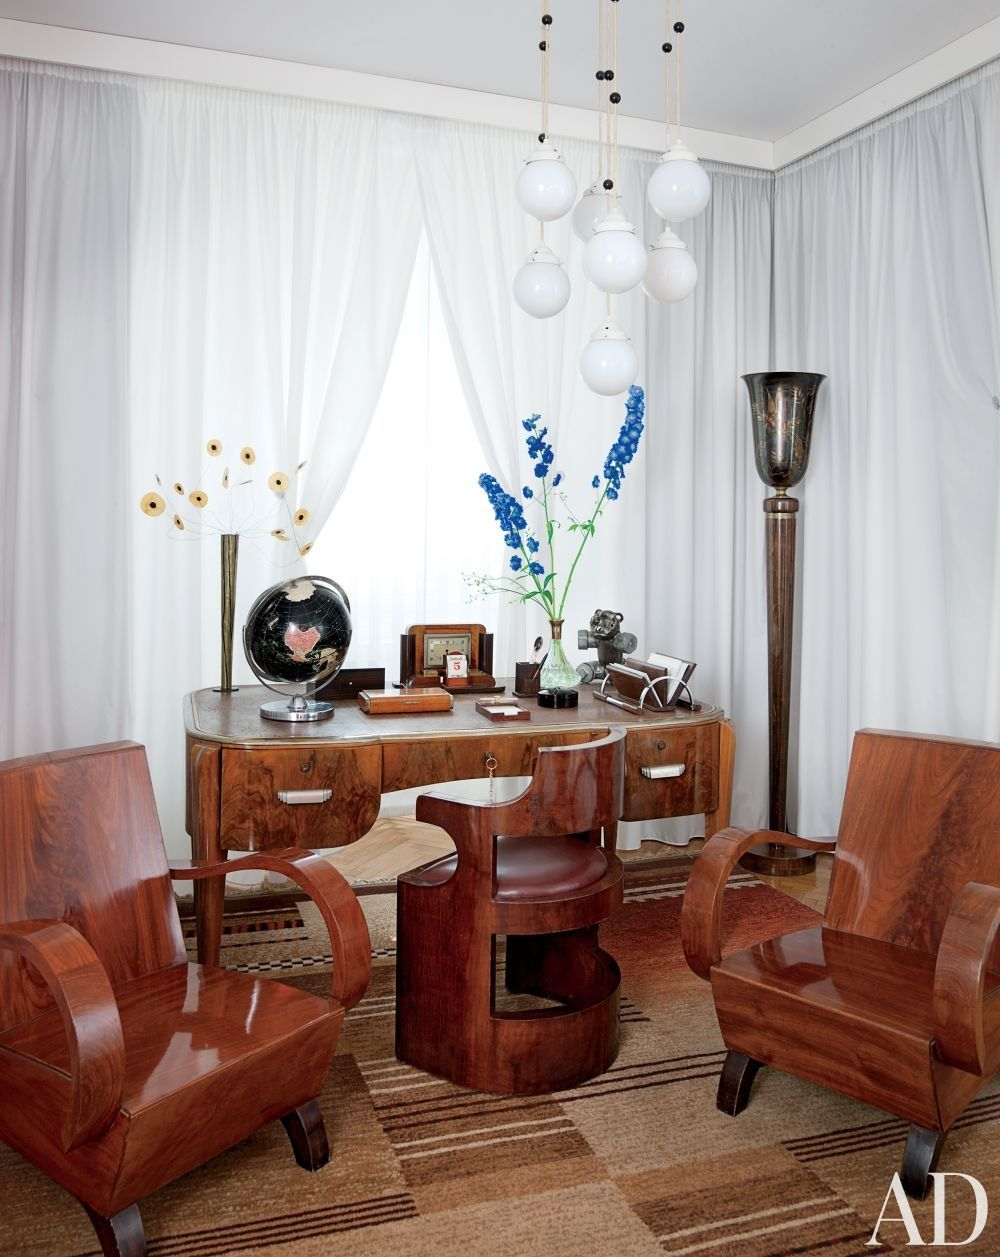 Contemporary dressing roomcloset by cesare rovatti the